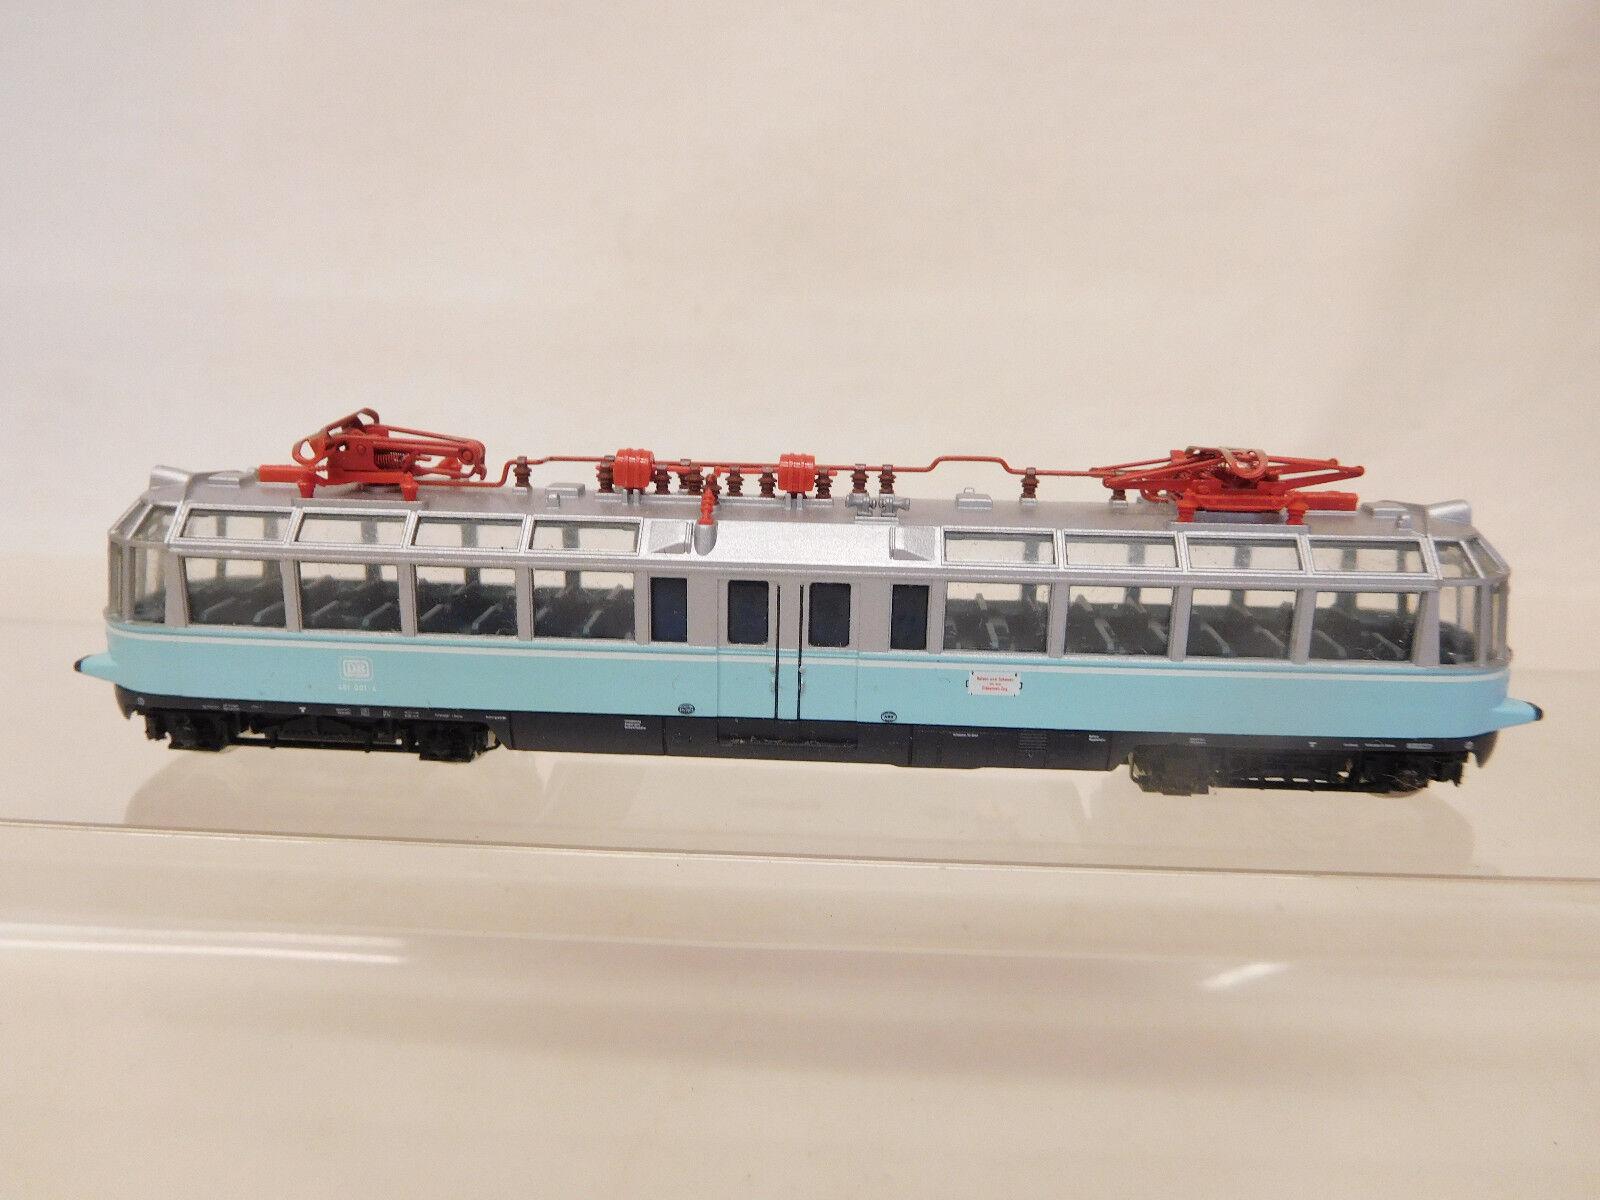 Mes-56549 Fleischuomon piccolo Spur N E-Lok  TRENO VETRO  DB 491 001-4